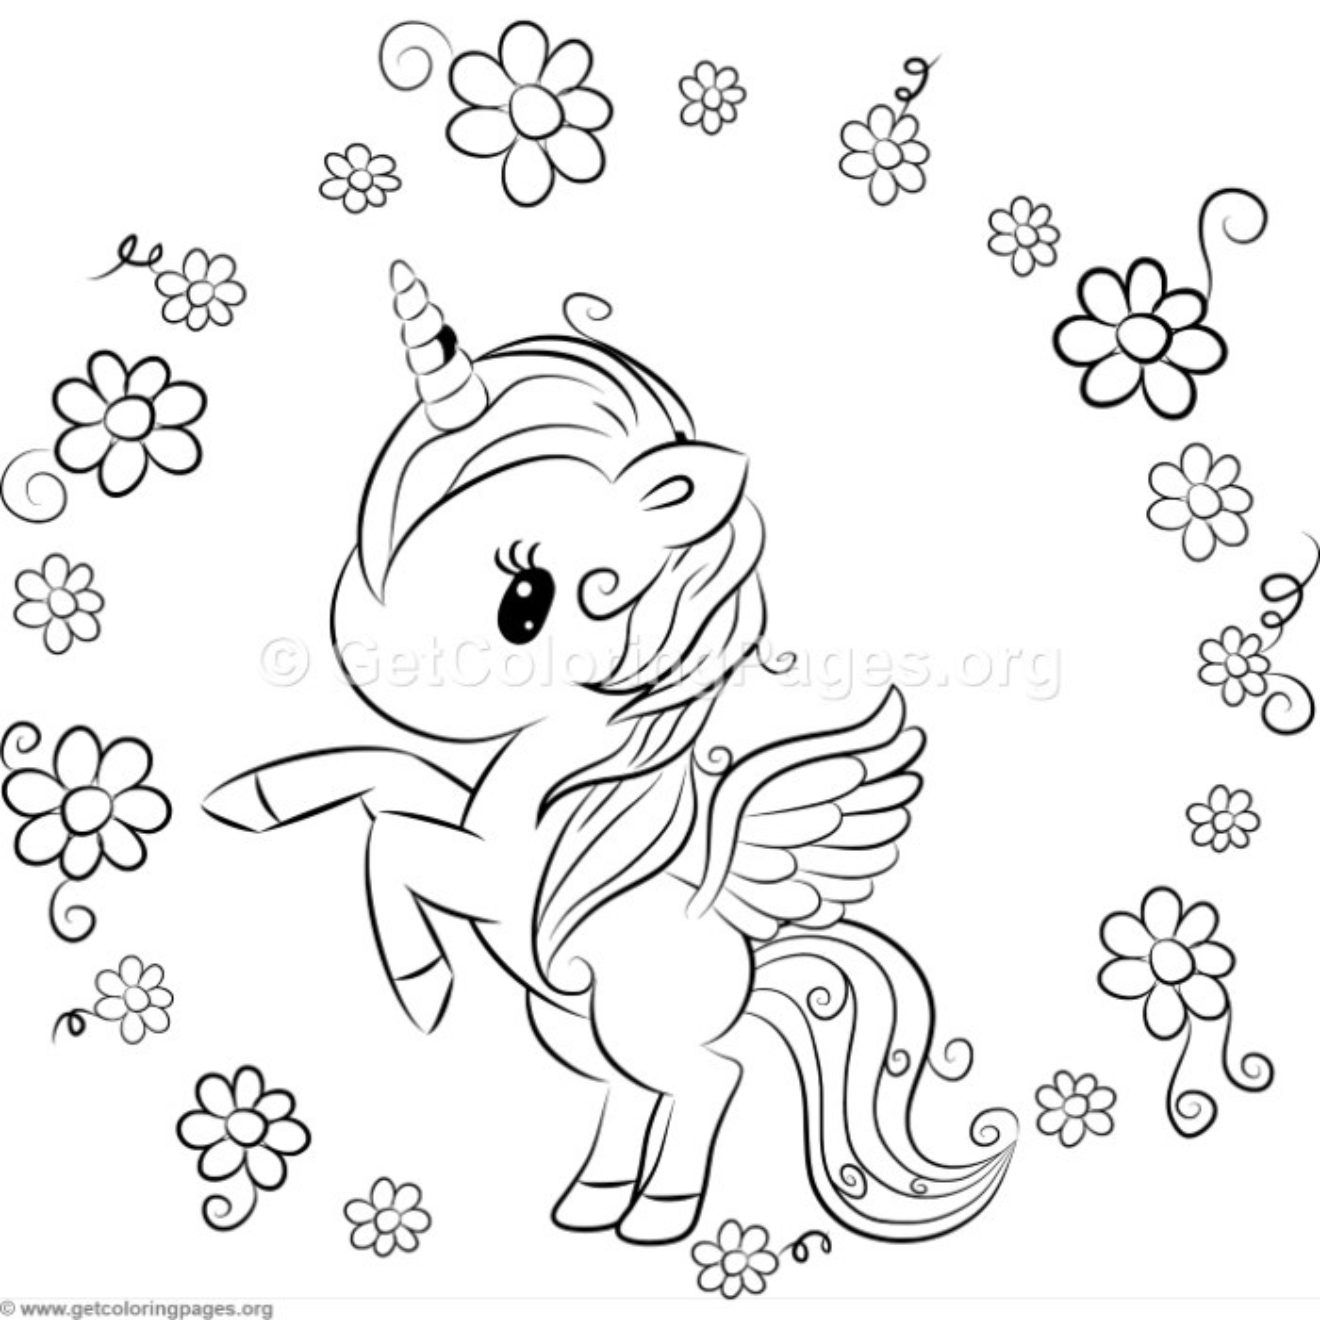 Cute Unicorn 9 Coloring Pages Getcoloringpages Org Kolorowanki